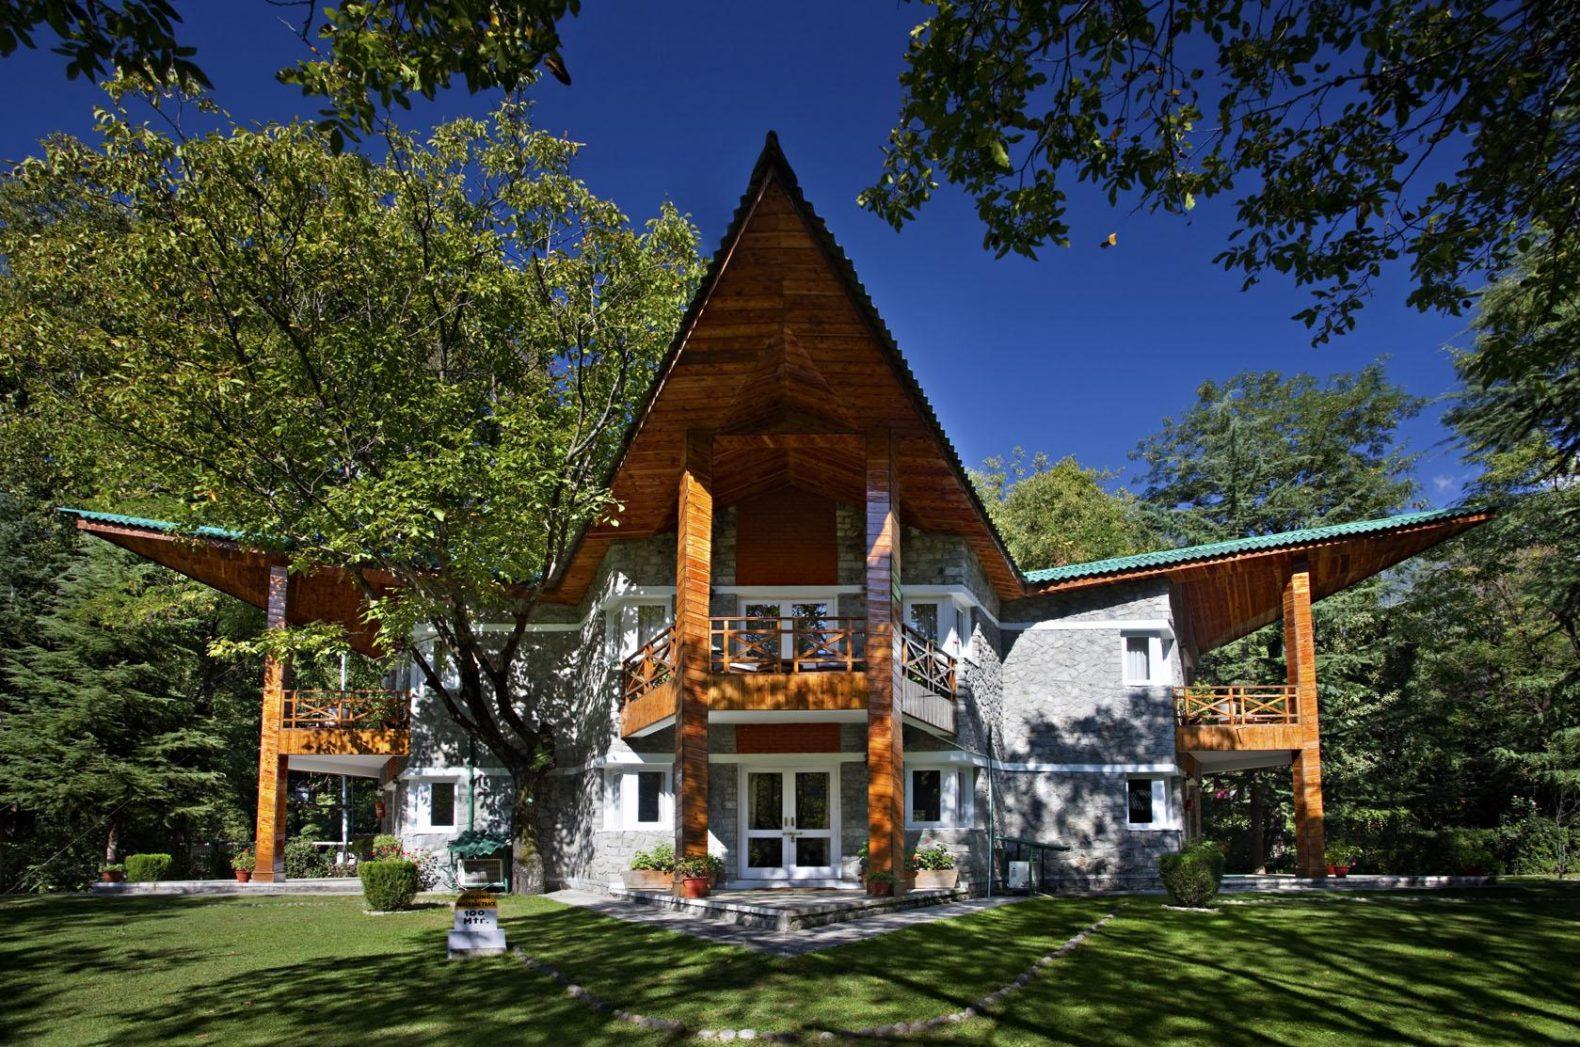 outside-exterior-garden-architecute-span-resort-spa-india